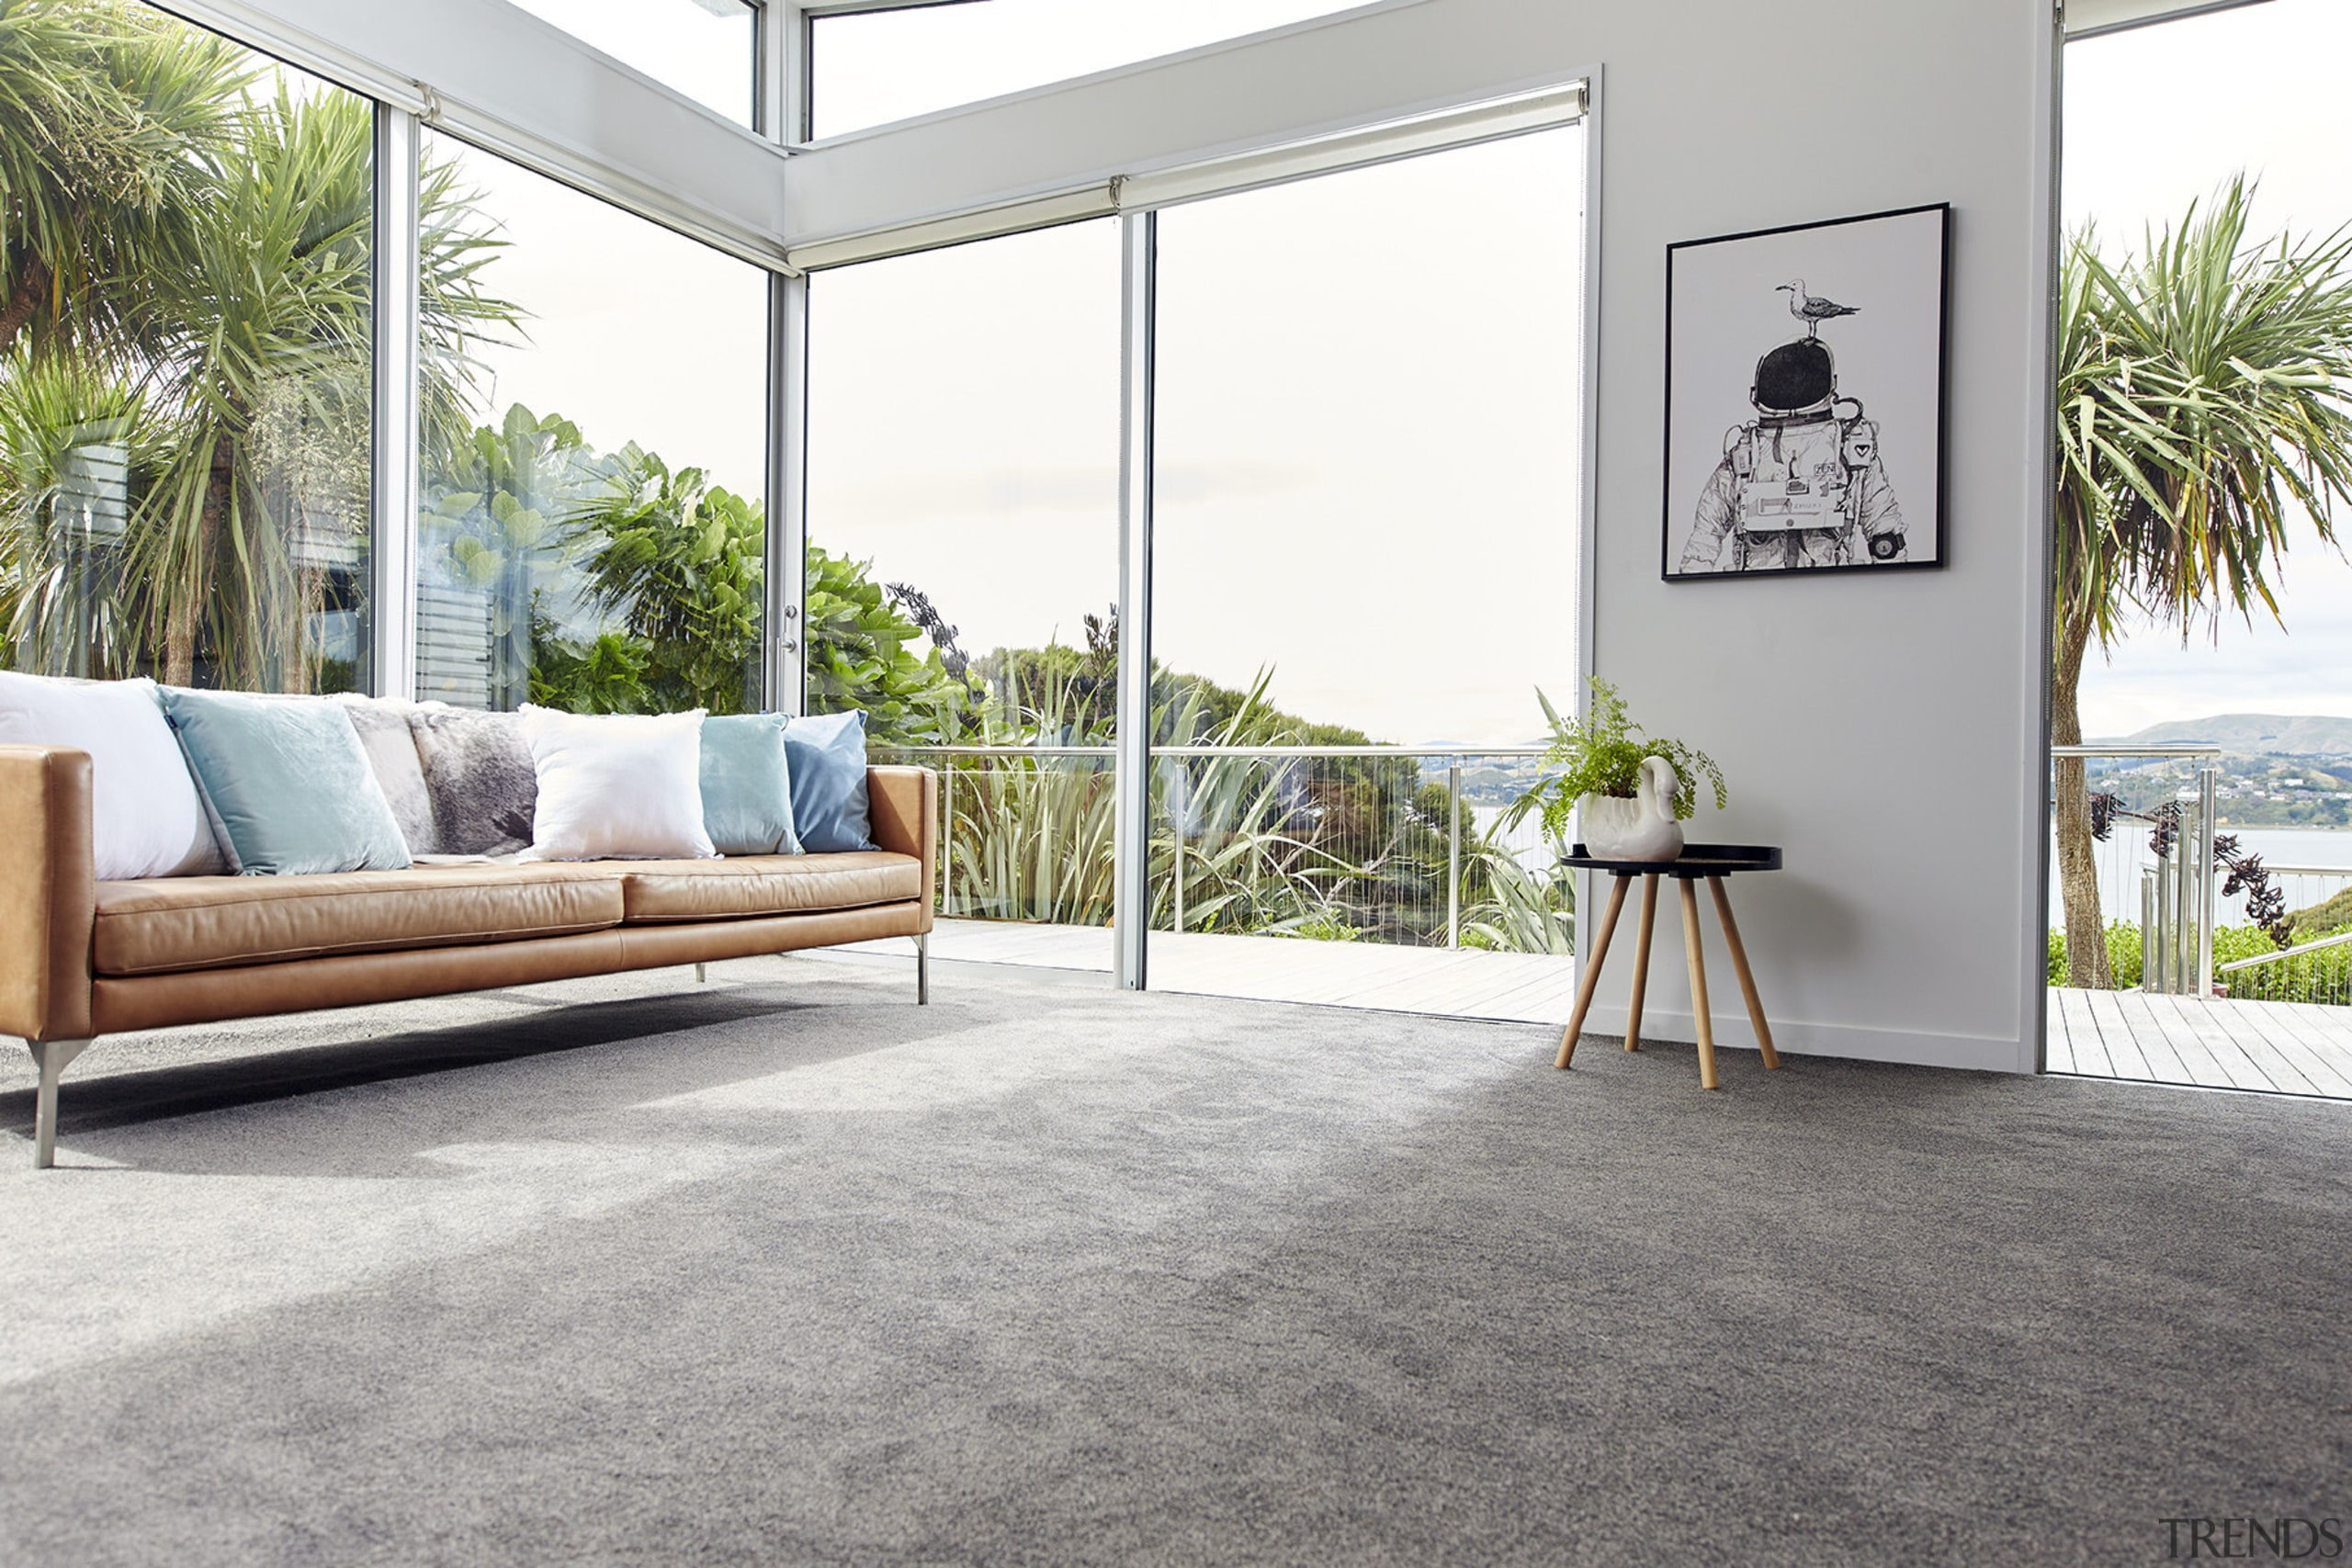 Choose between wool or Solution-dyed Nylon (SDN) carpet.Carpet: door, estate, floor, flooring, furniture, hardwood, home, house, interior design, laminate flooring, living room, property, real estate, table, window, wood, wood flooring, white, gray